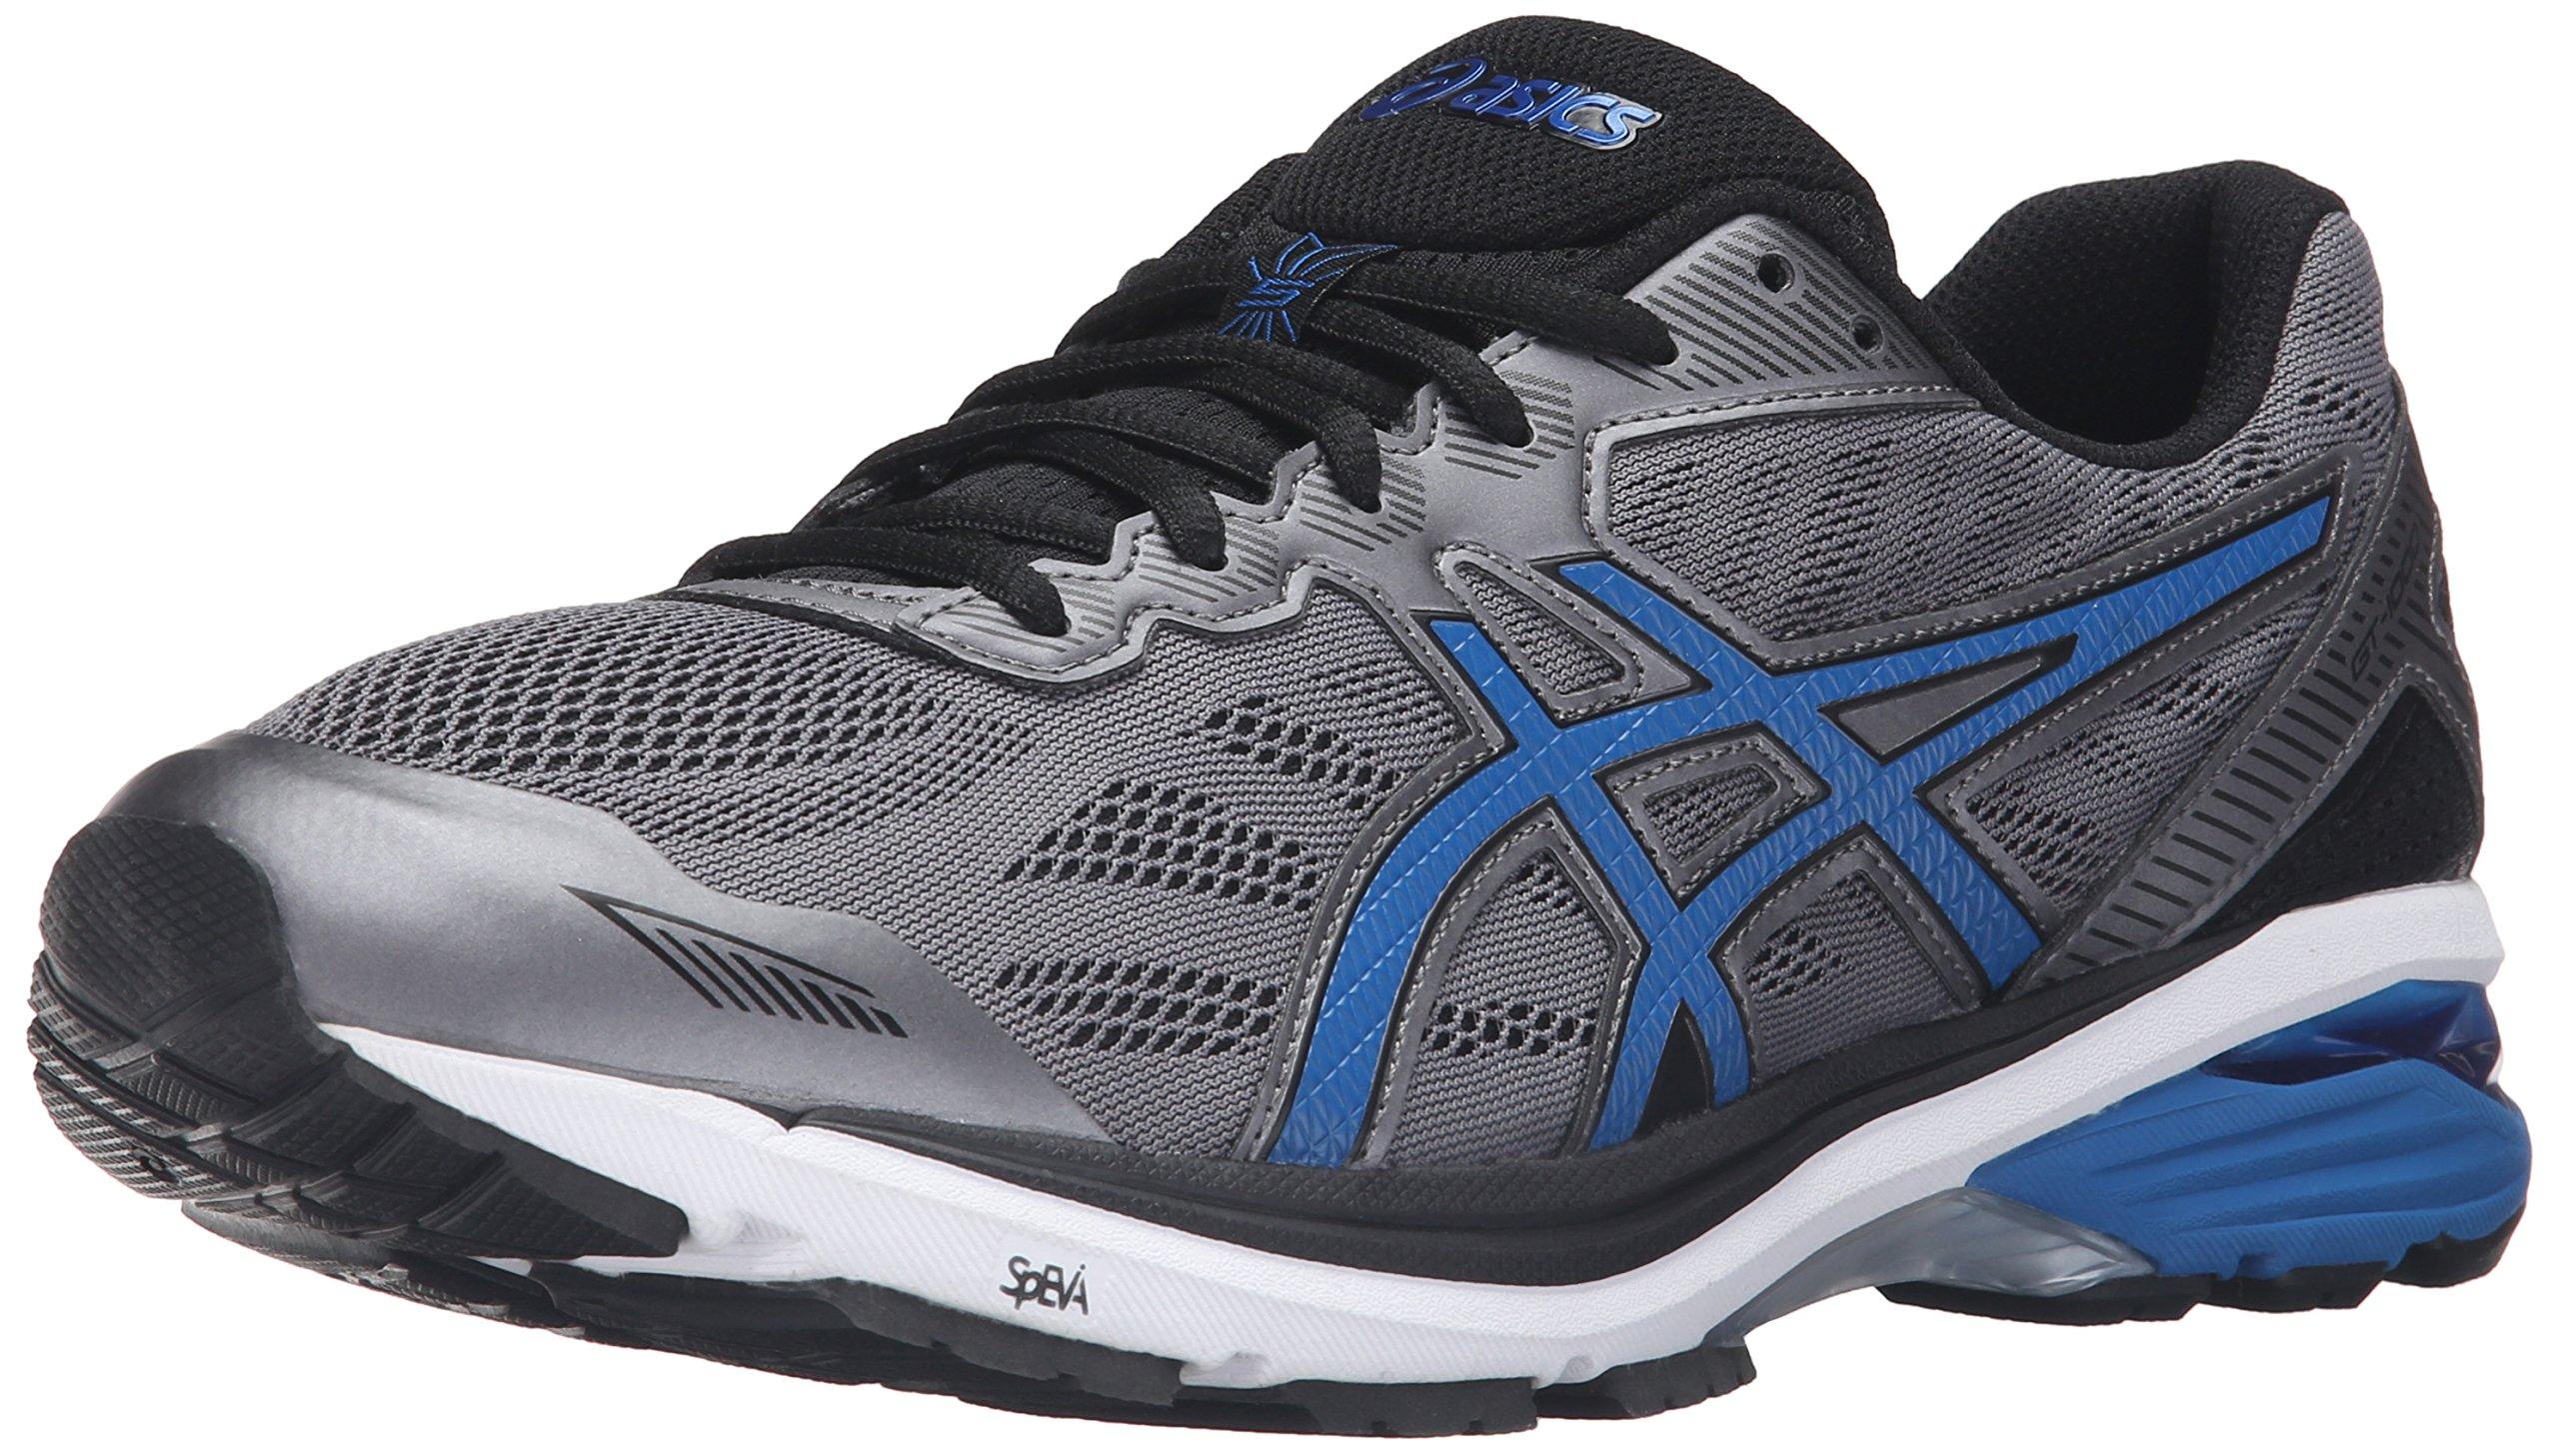 ASICS Men's Gt-1000 5 Running Shoe, Carbon/Imperial/Black, 12 M US